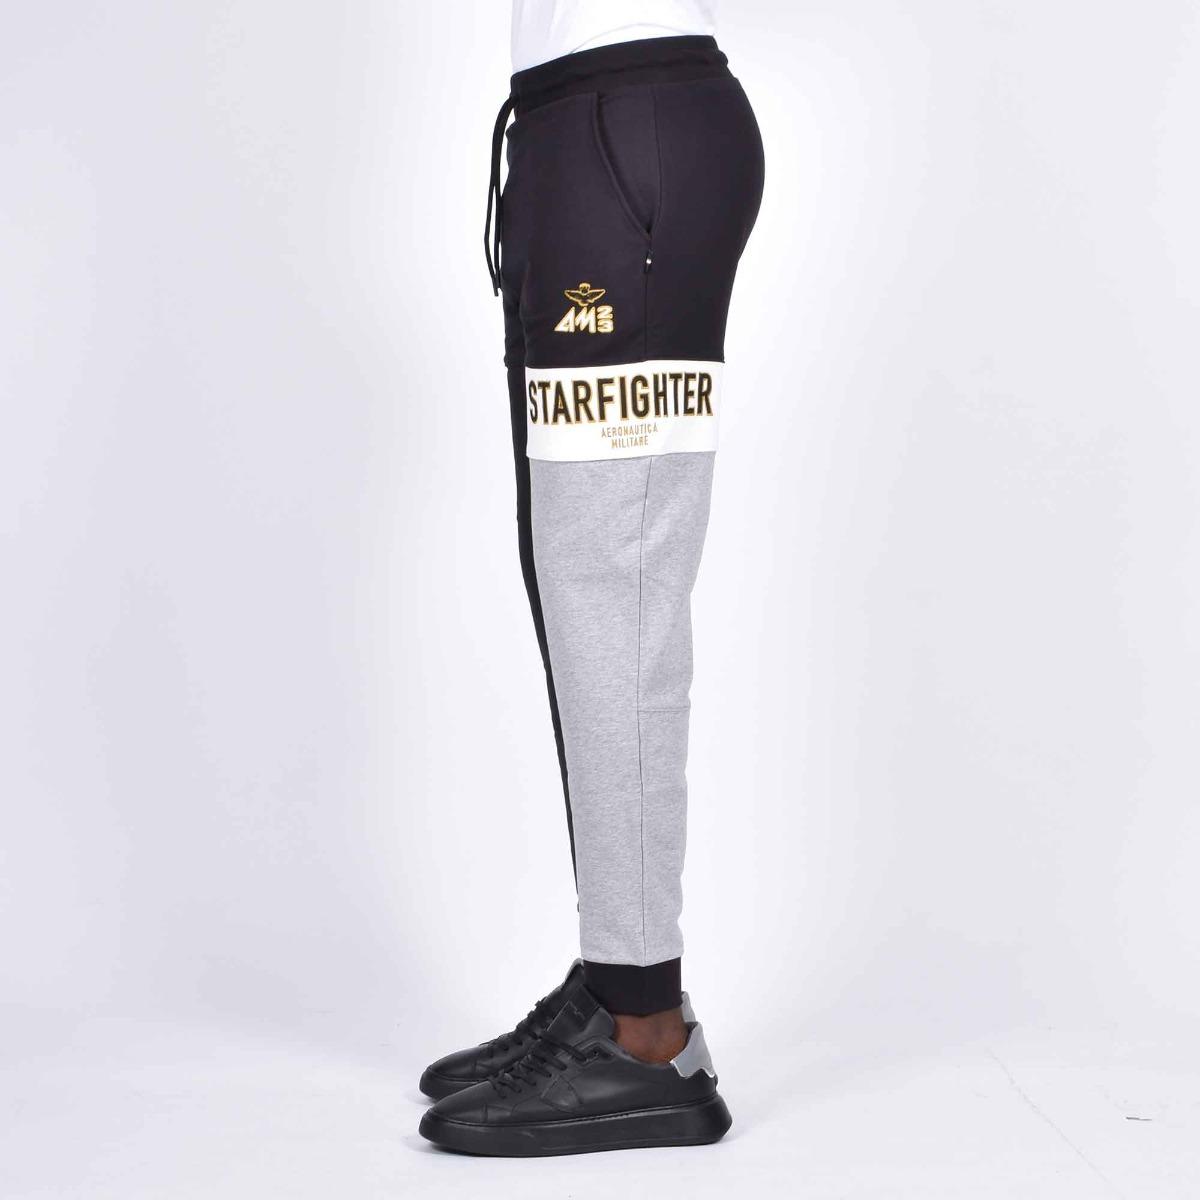 Pantalone felpa starfighter - Nero/grigio